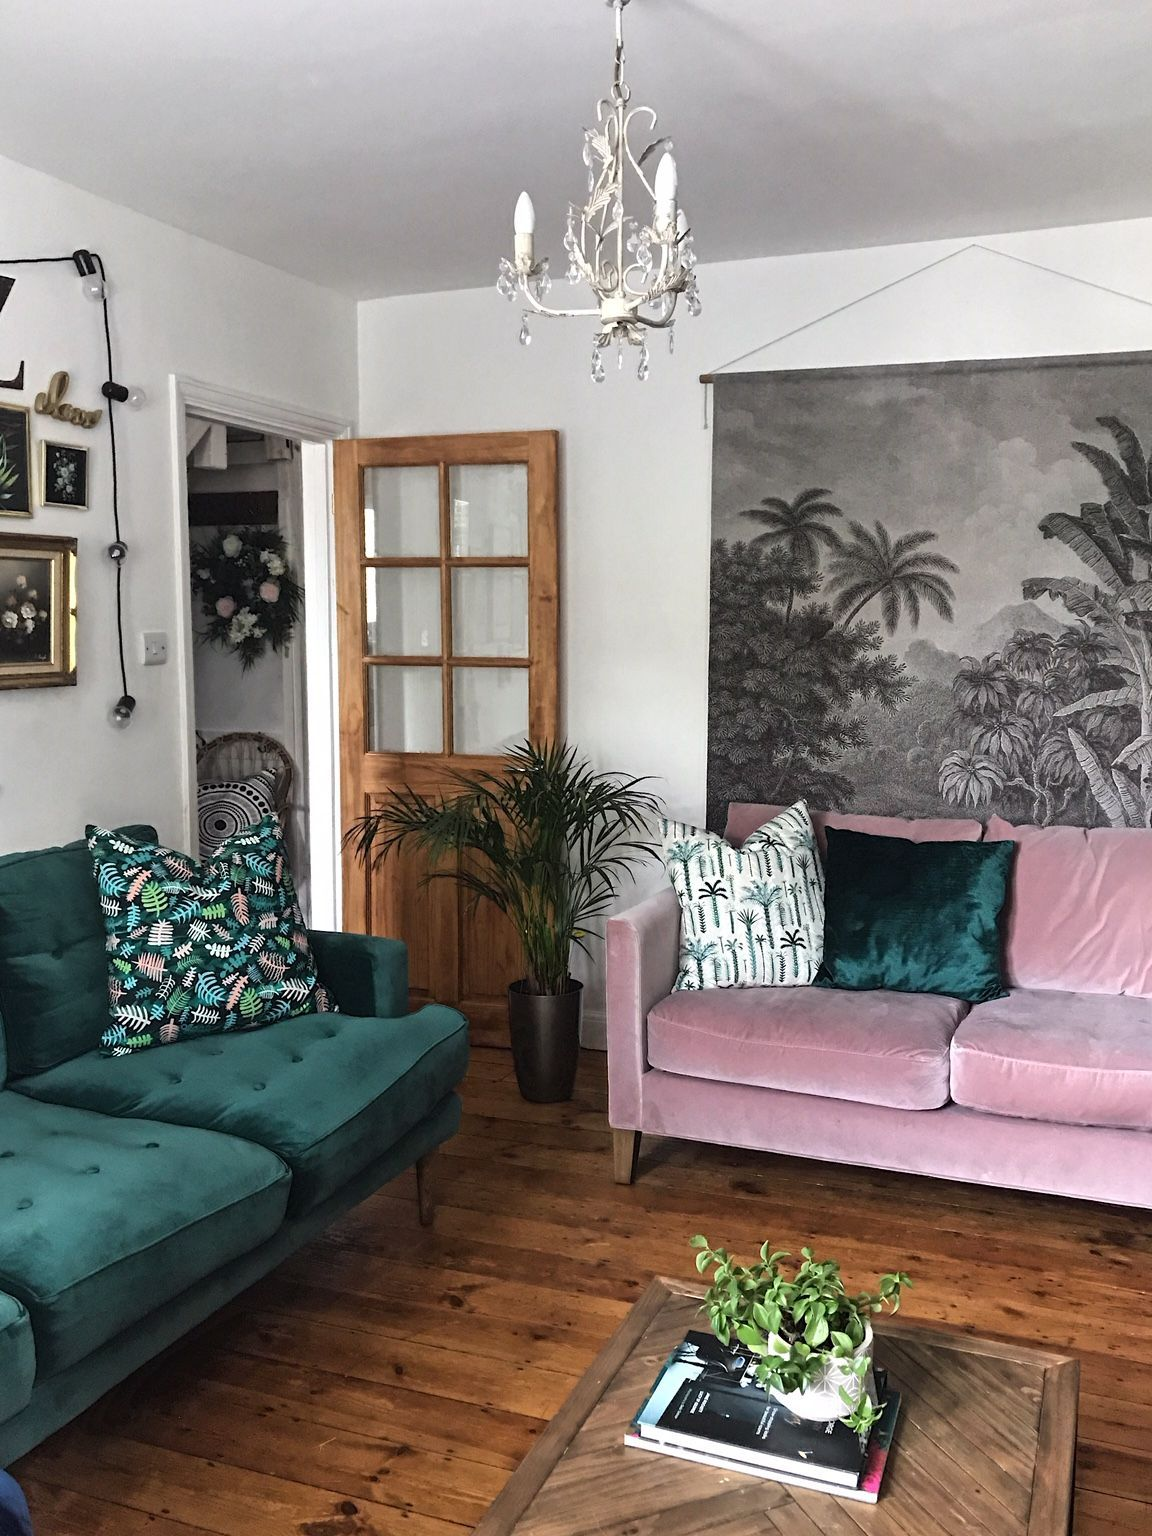 Mein Sofa Com Stil Ist Mit Sofa Com Ein Neues Sofa Auswahlen Pink Living Room Home Living Room Living Room Green